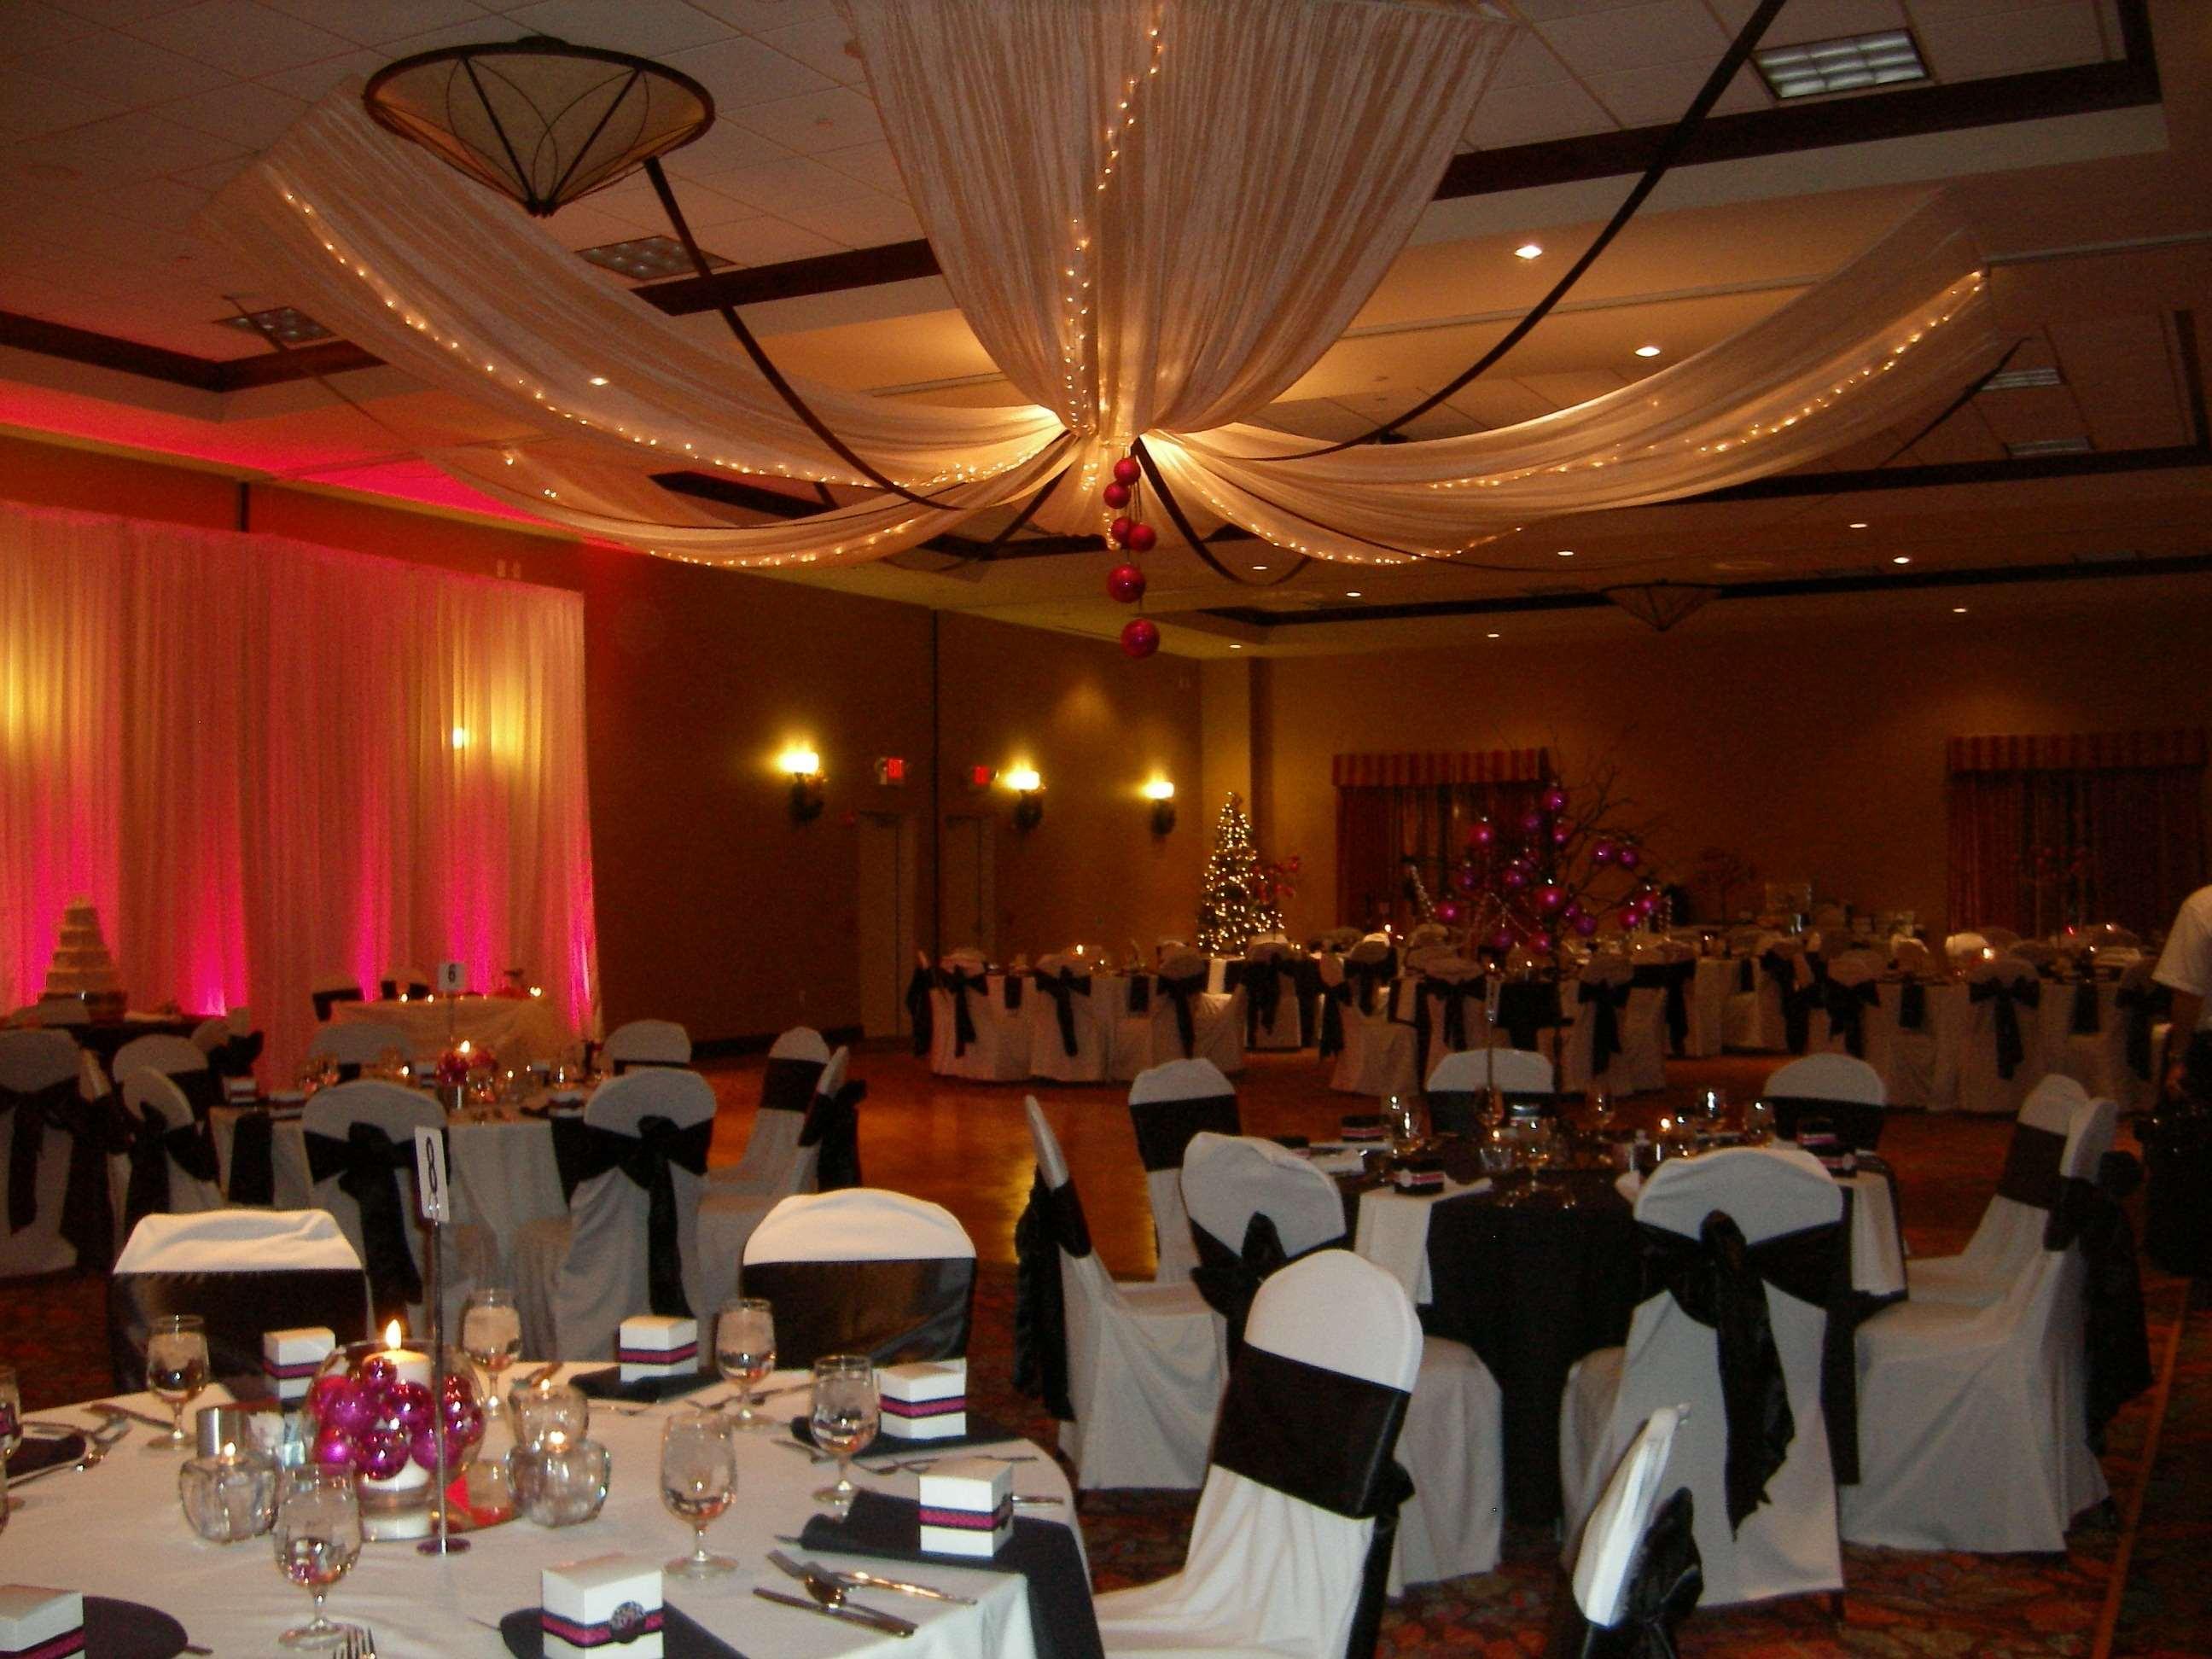 Hilton Garden Inn Dayton Beavercreek image 33